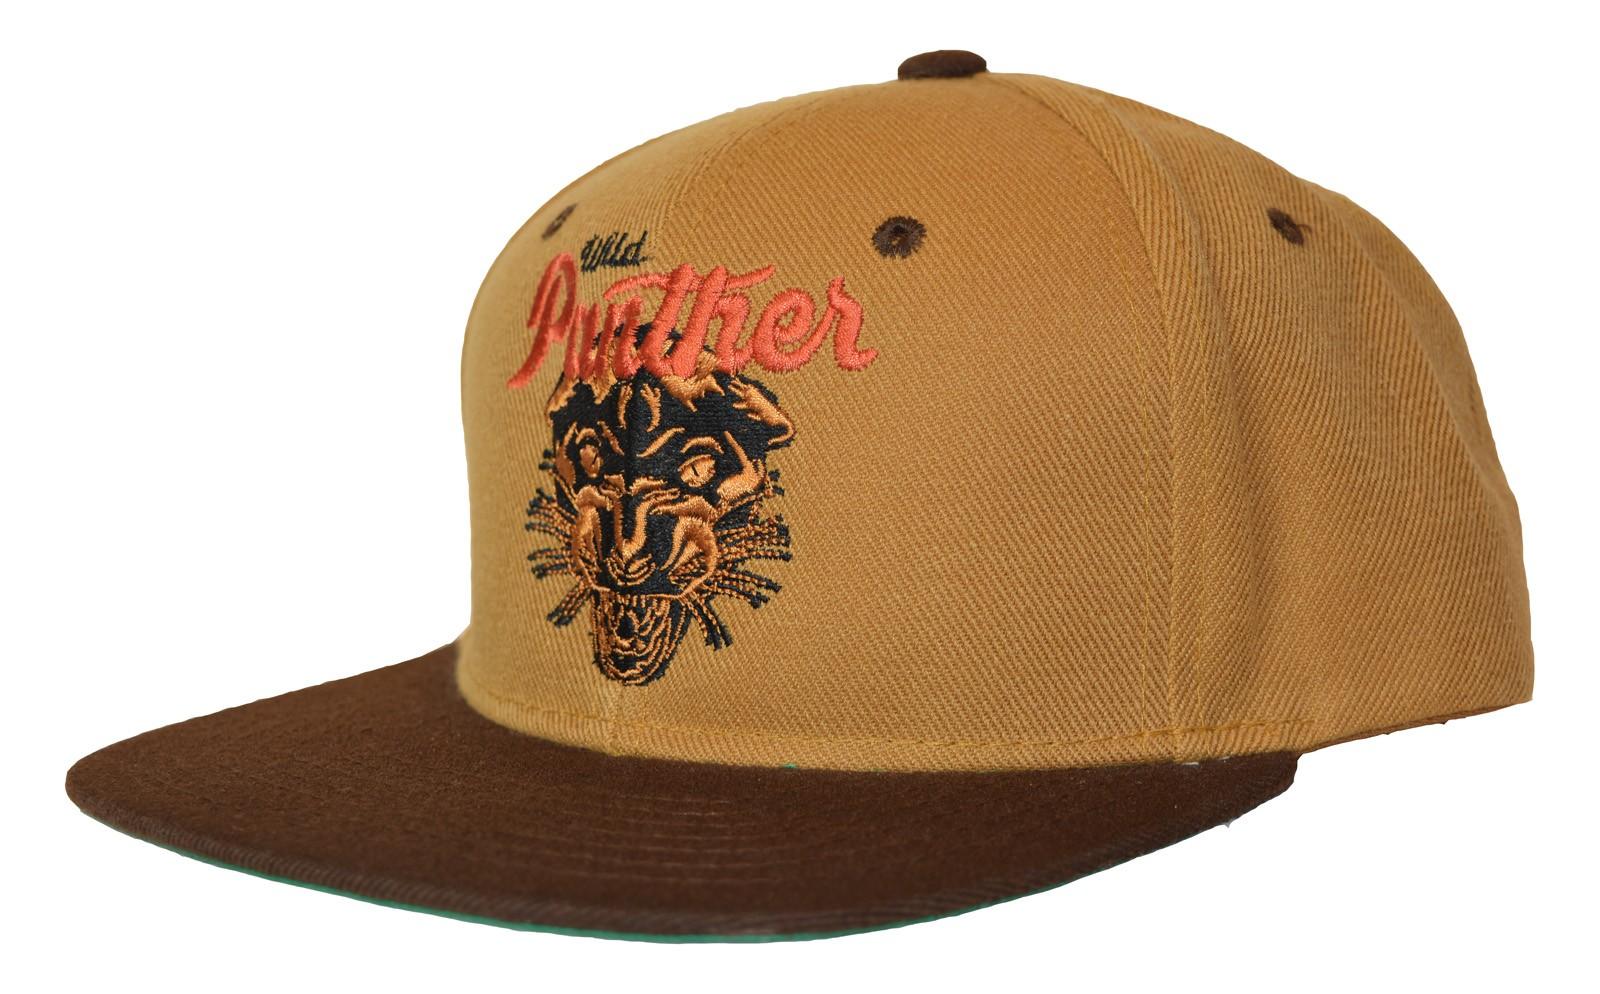 Supercobra Clothing Company - Wild Panther Snapback Cap